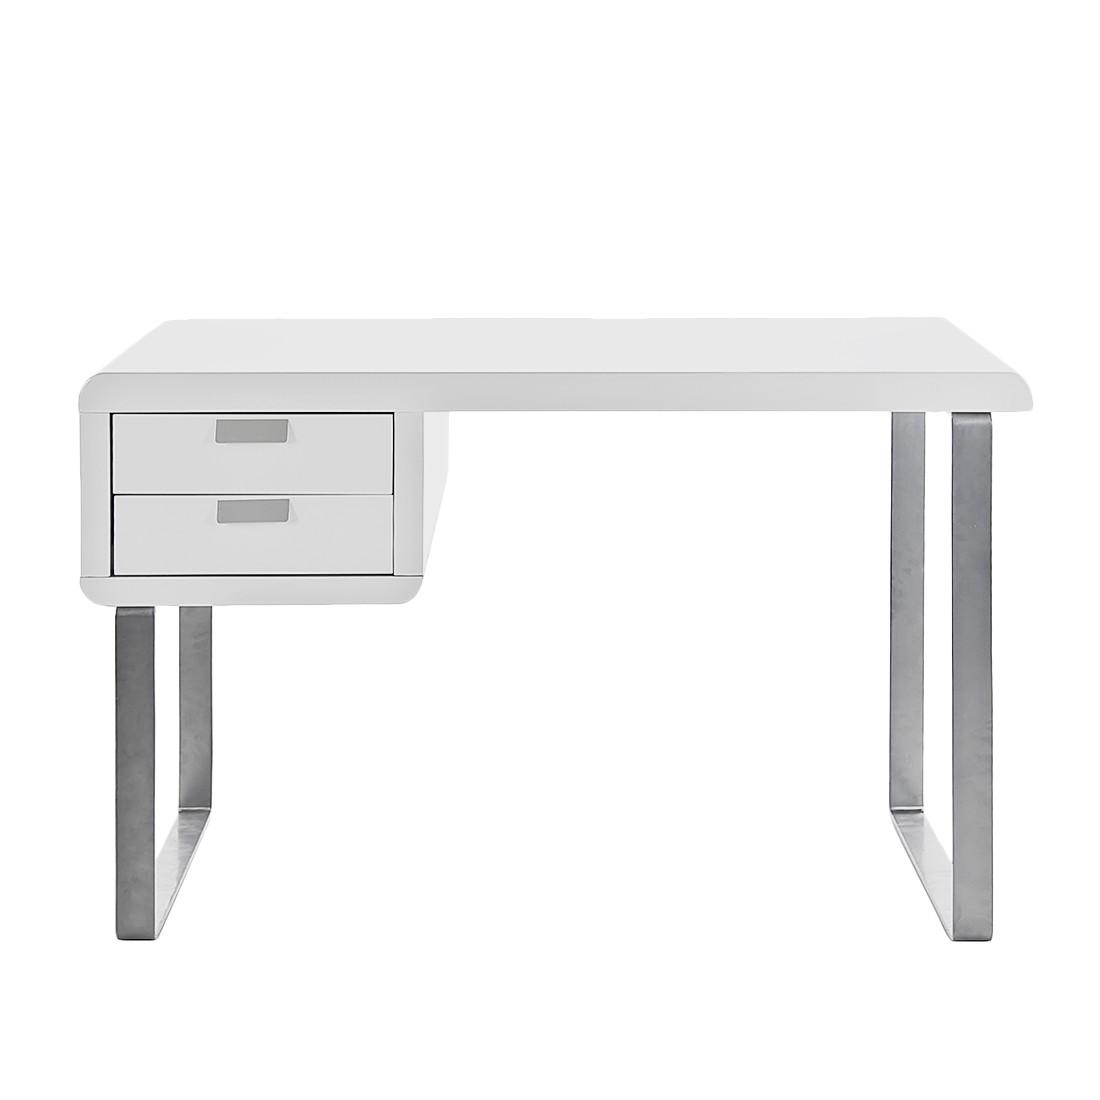 preisvergleich eu schreibtisch 120 hochglanz. Black Bedroom Furniture Sets. Home Design Ideas